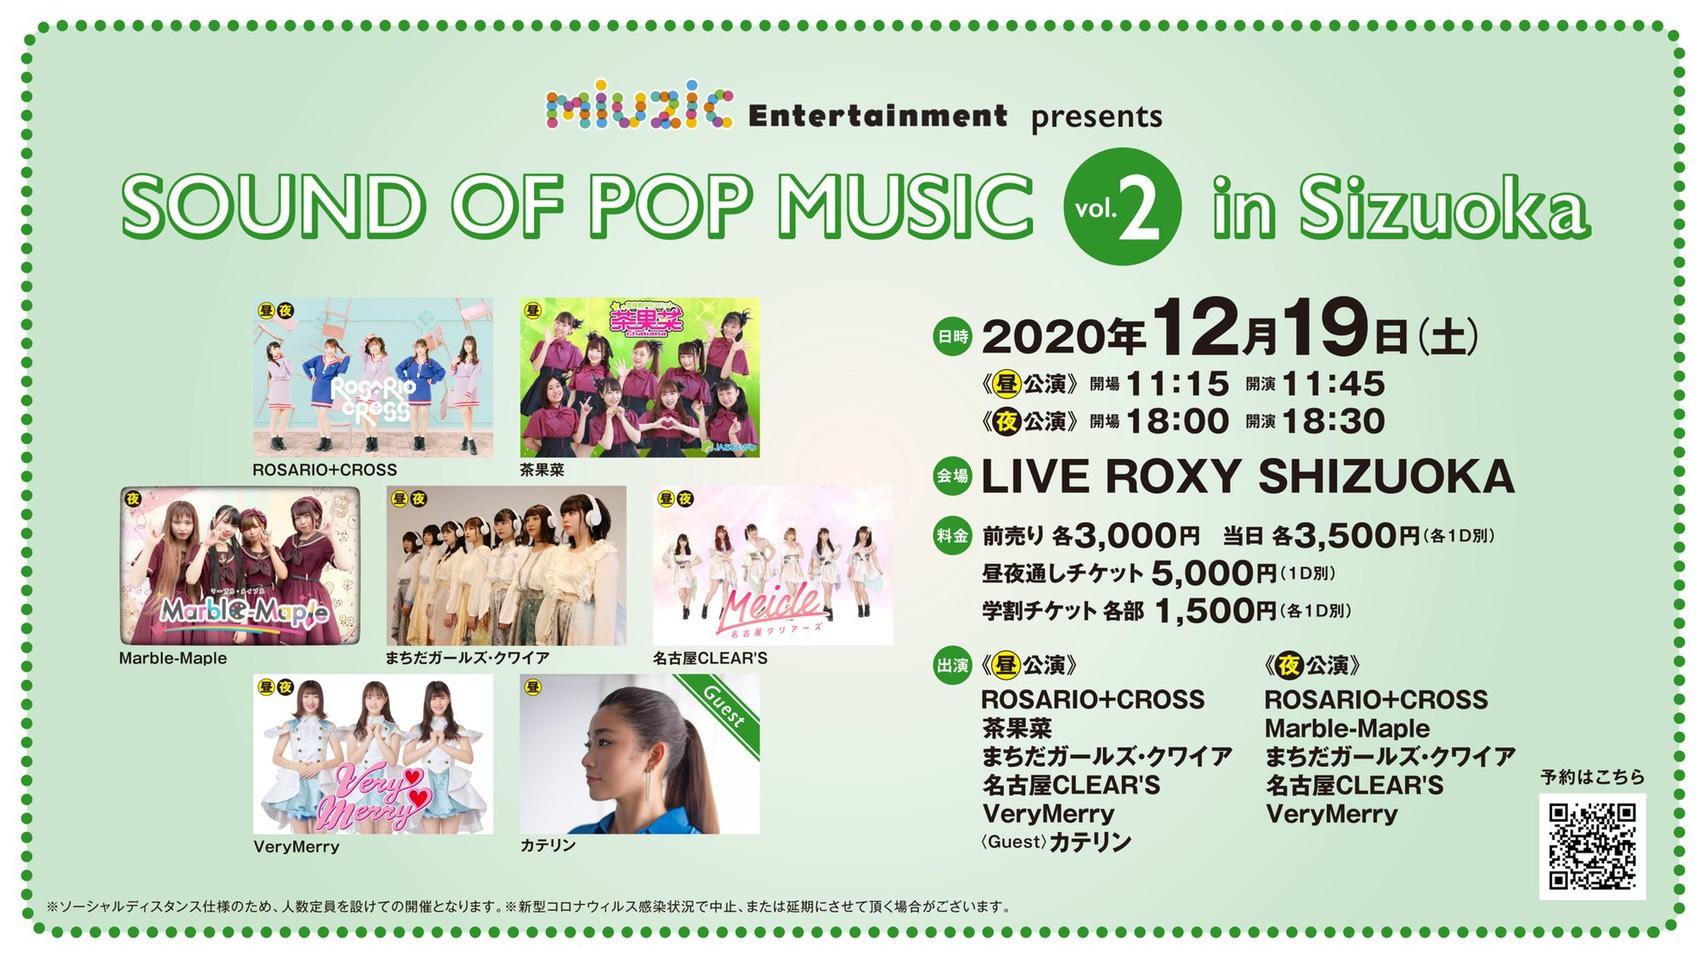 miuzic Entertainment presents 「SOUND OF POP MUSIC vol.2 in Shizuoka」